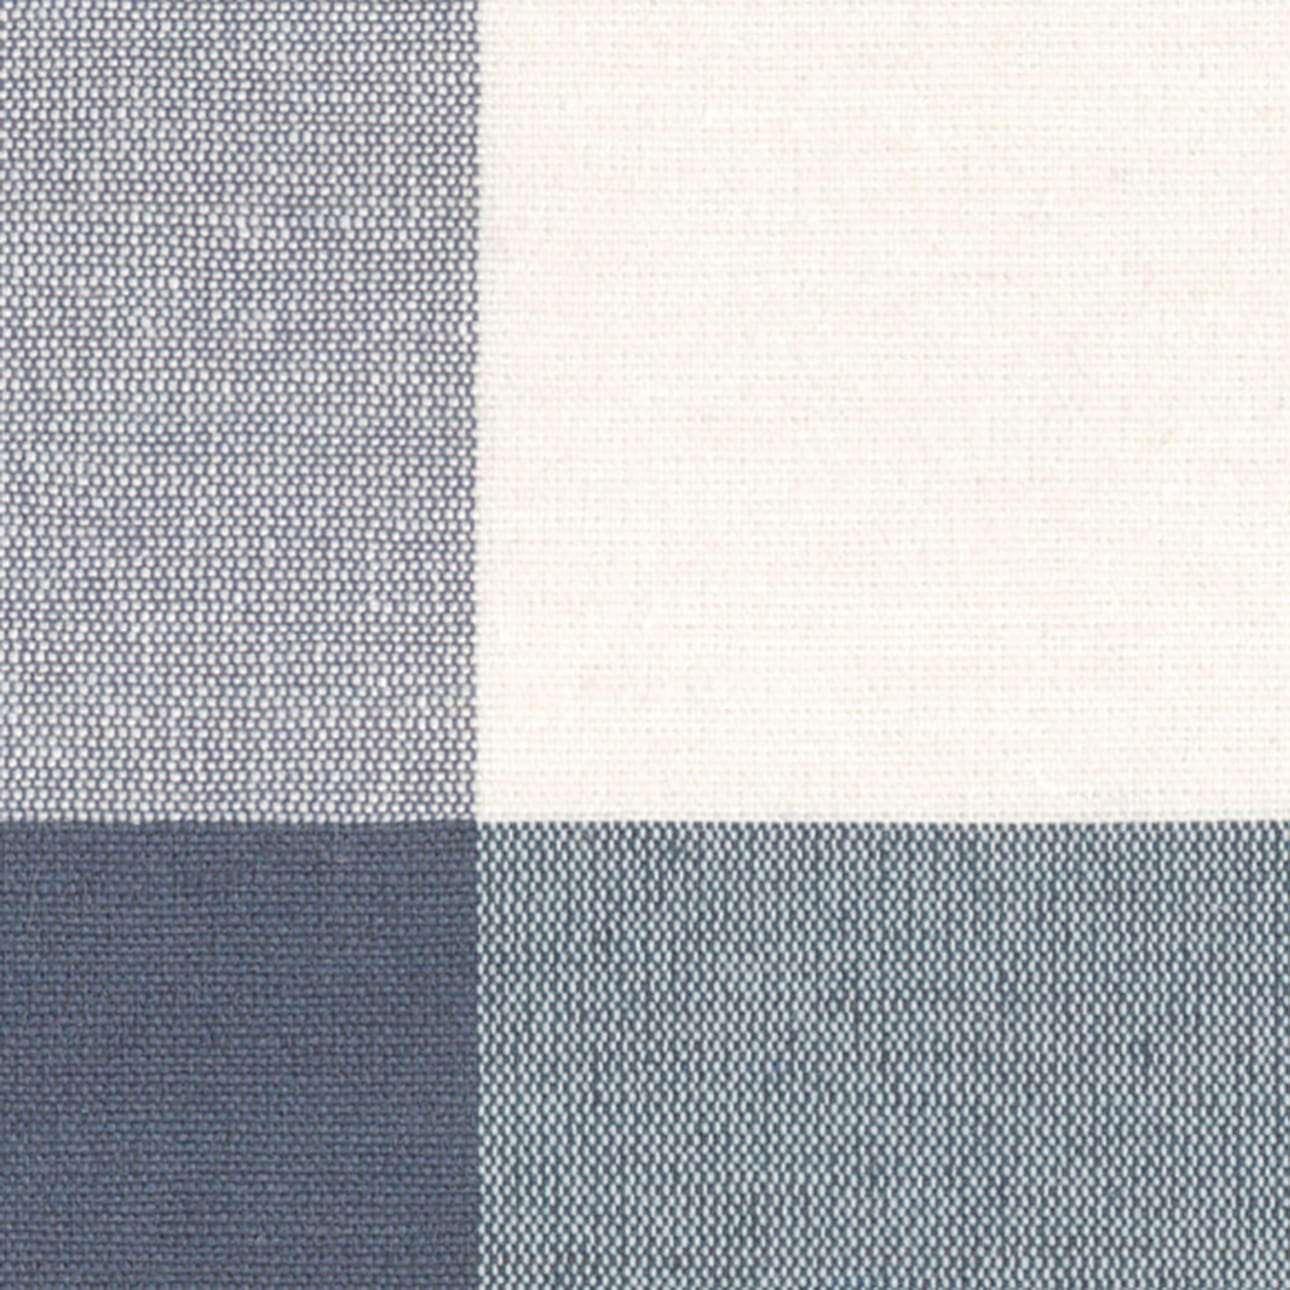 Podkładka 2 sztuki w kolekcji Quadro, tkanina: 136-03